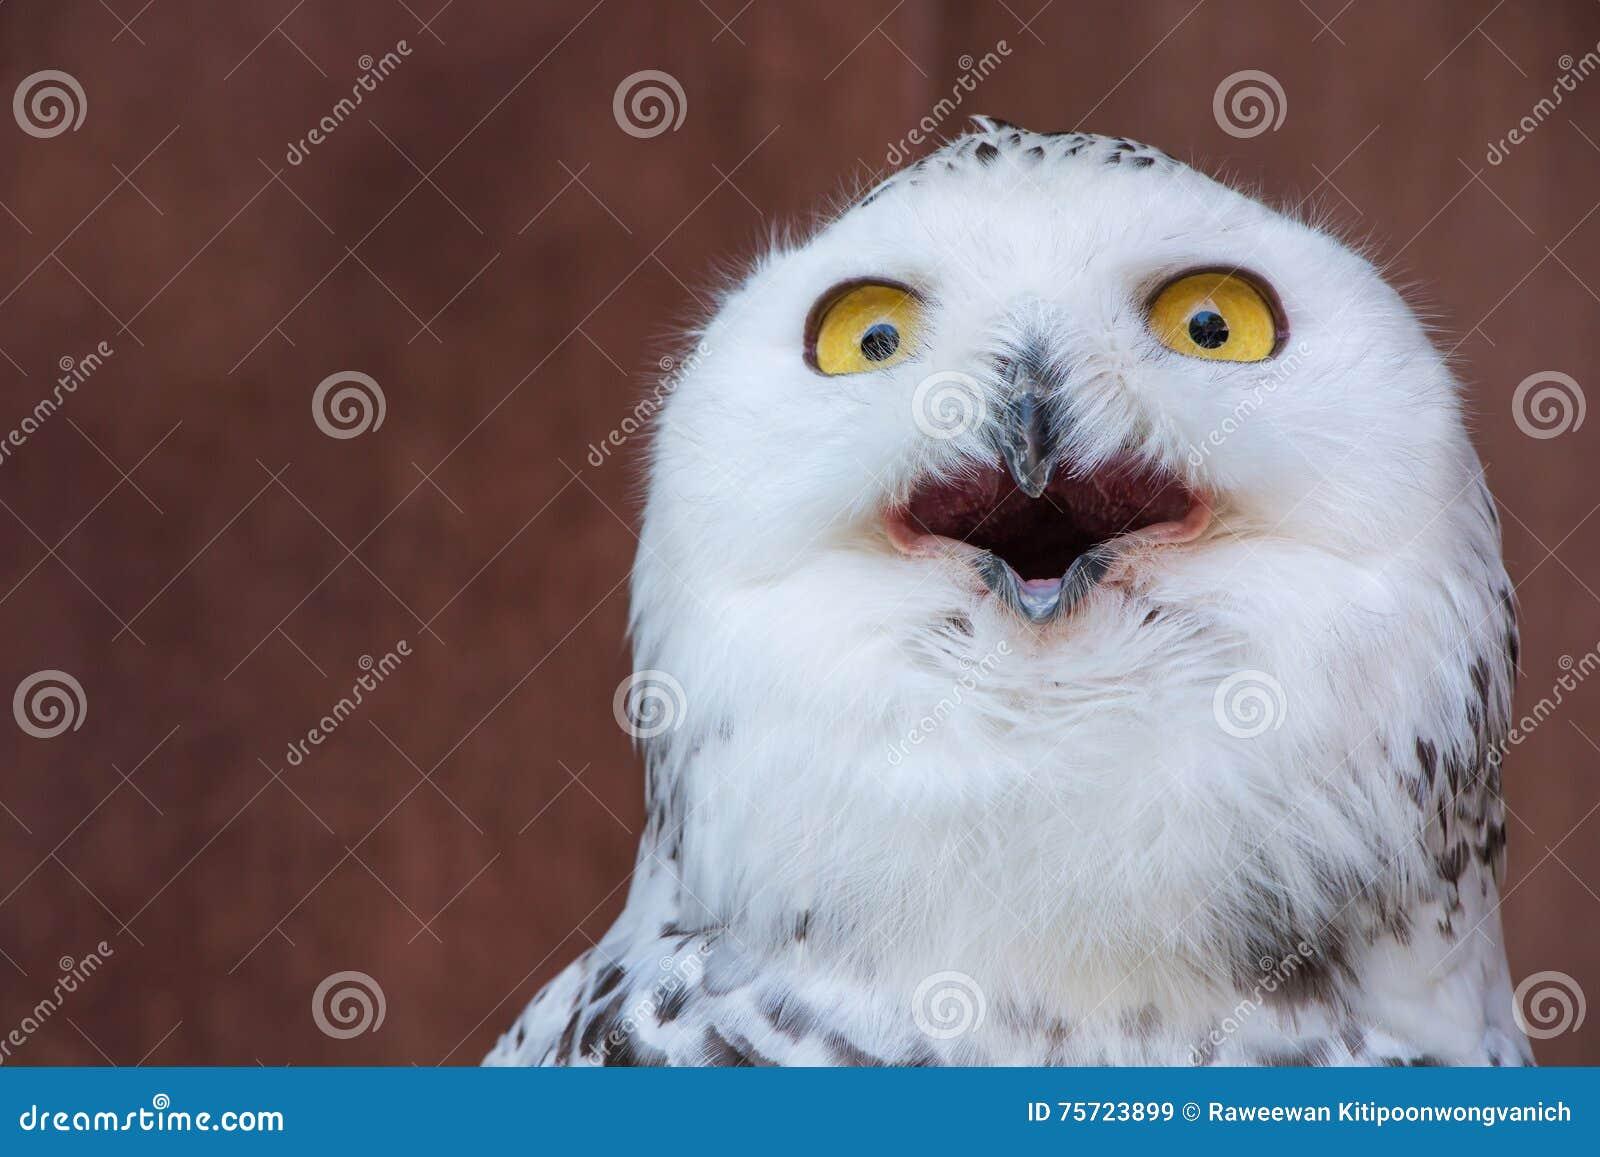 White Owl with shocking meme face